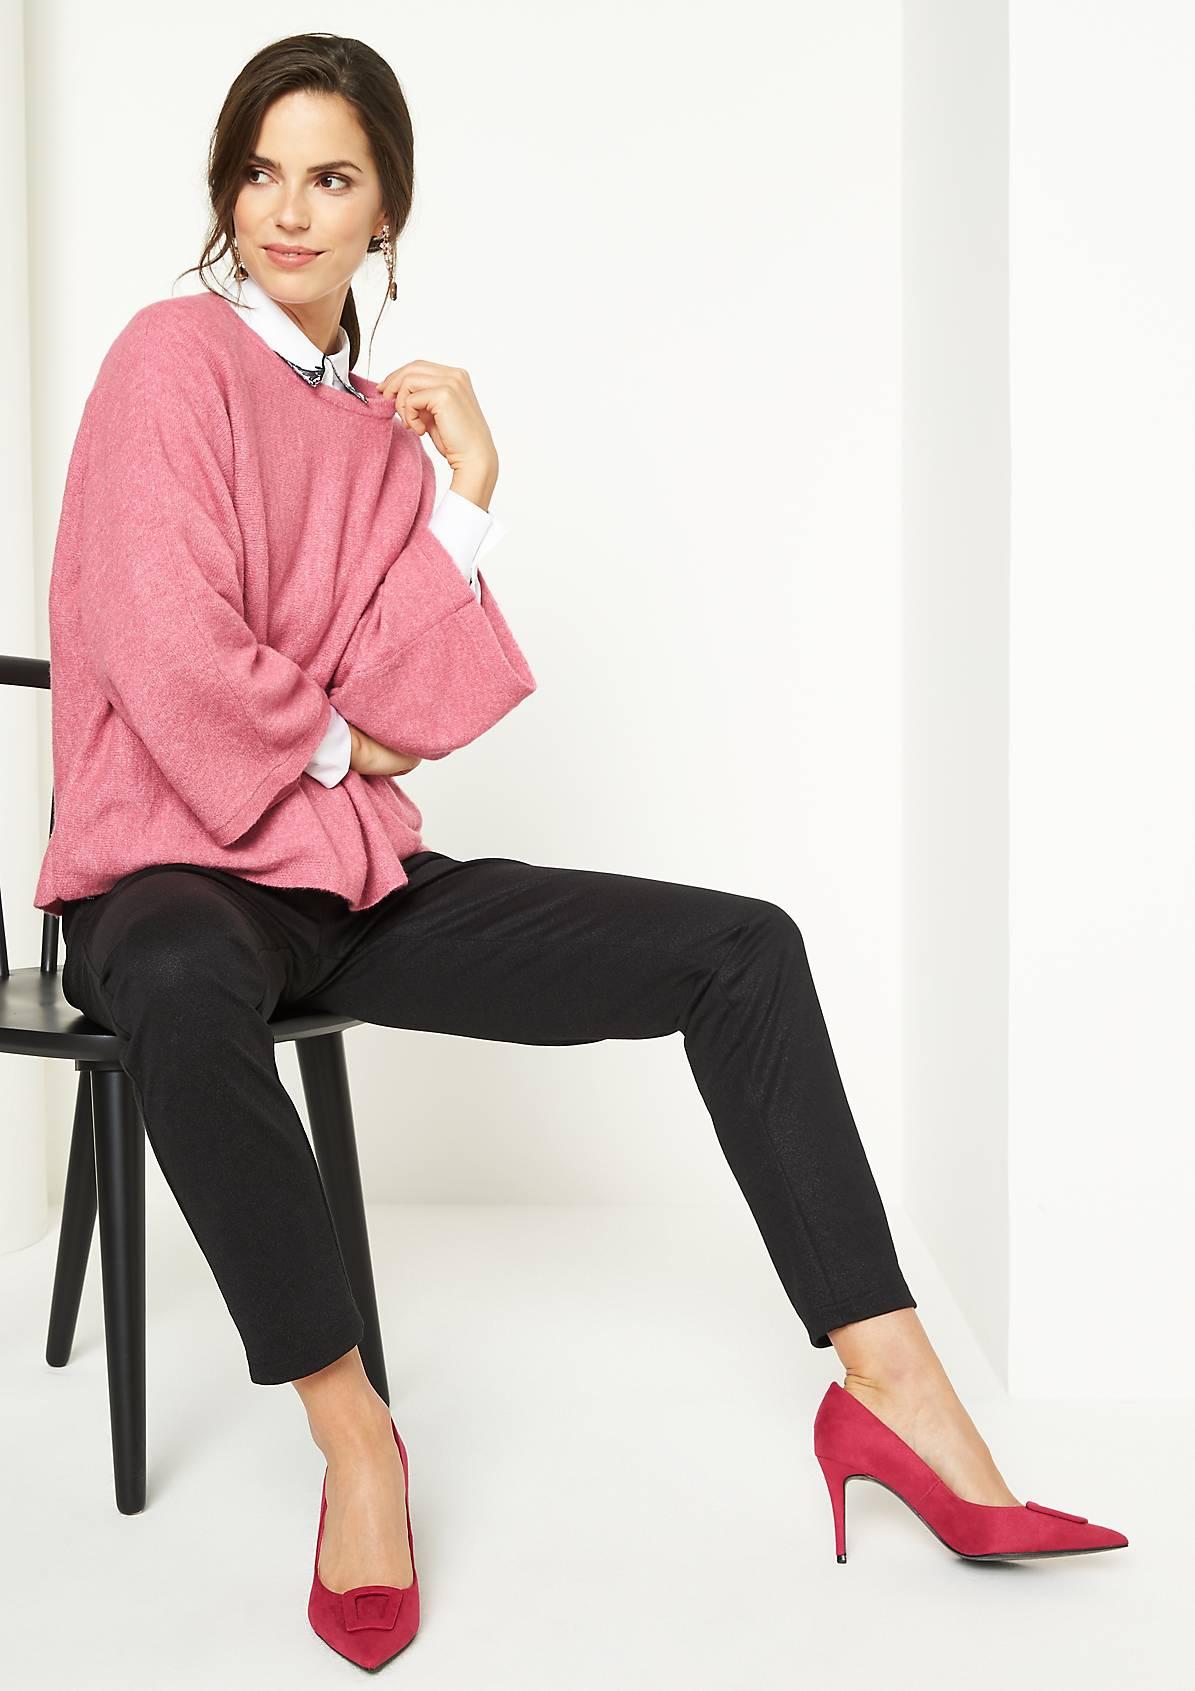 Comma Poncho Online 812 90 Store Fashion 4437 81 Mode amp; xRUqA0w